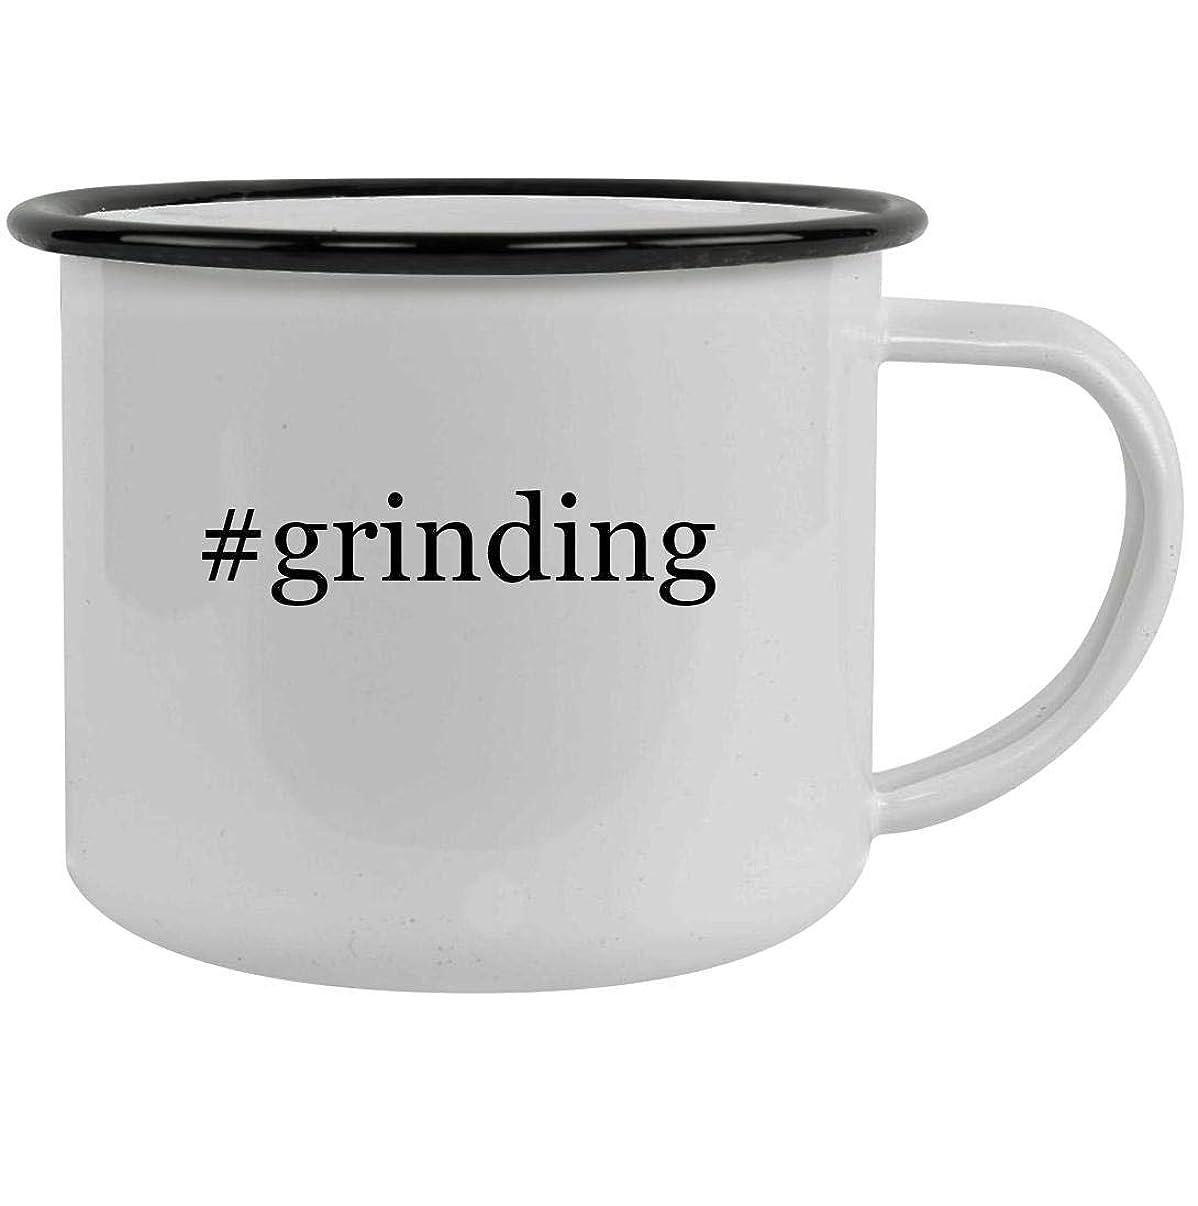 #grinding - 12oz Hashtag Stainless Steel Camping Mug, Black